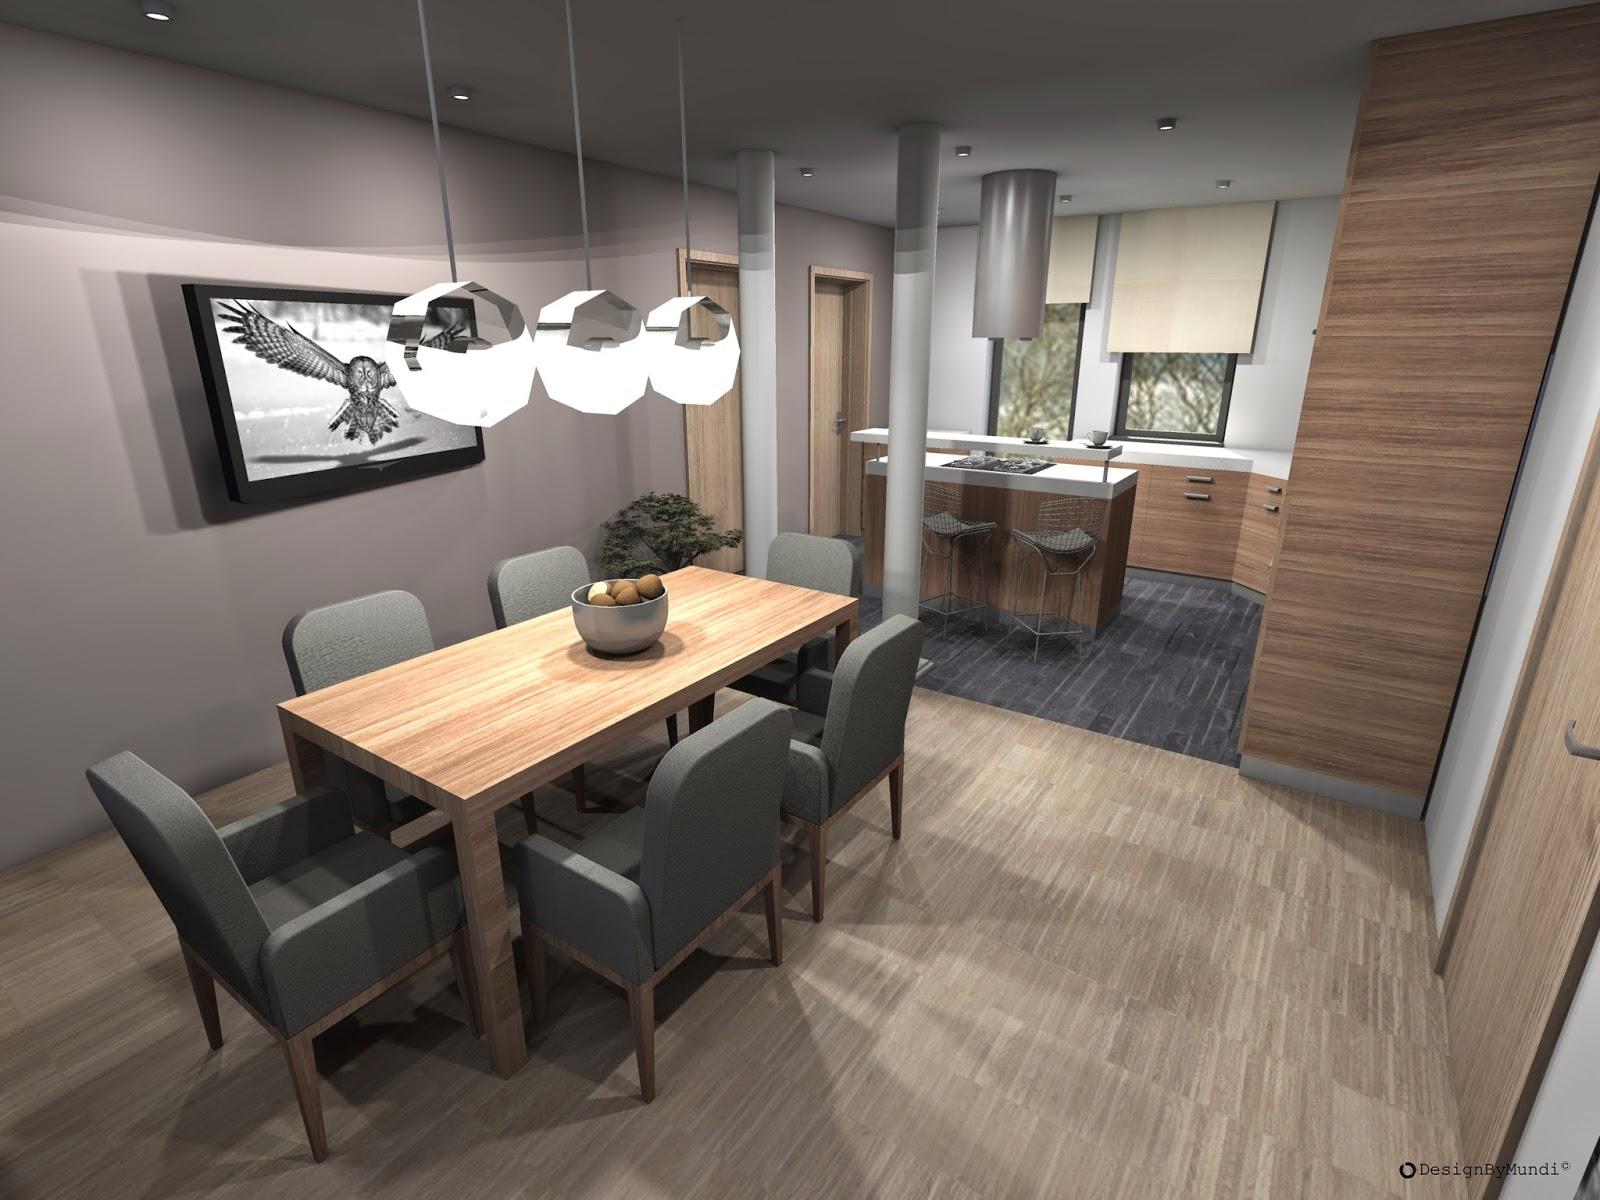 http://melitatoth.com/p/interior-design.html